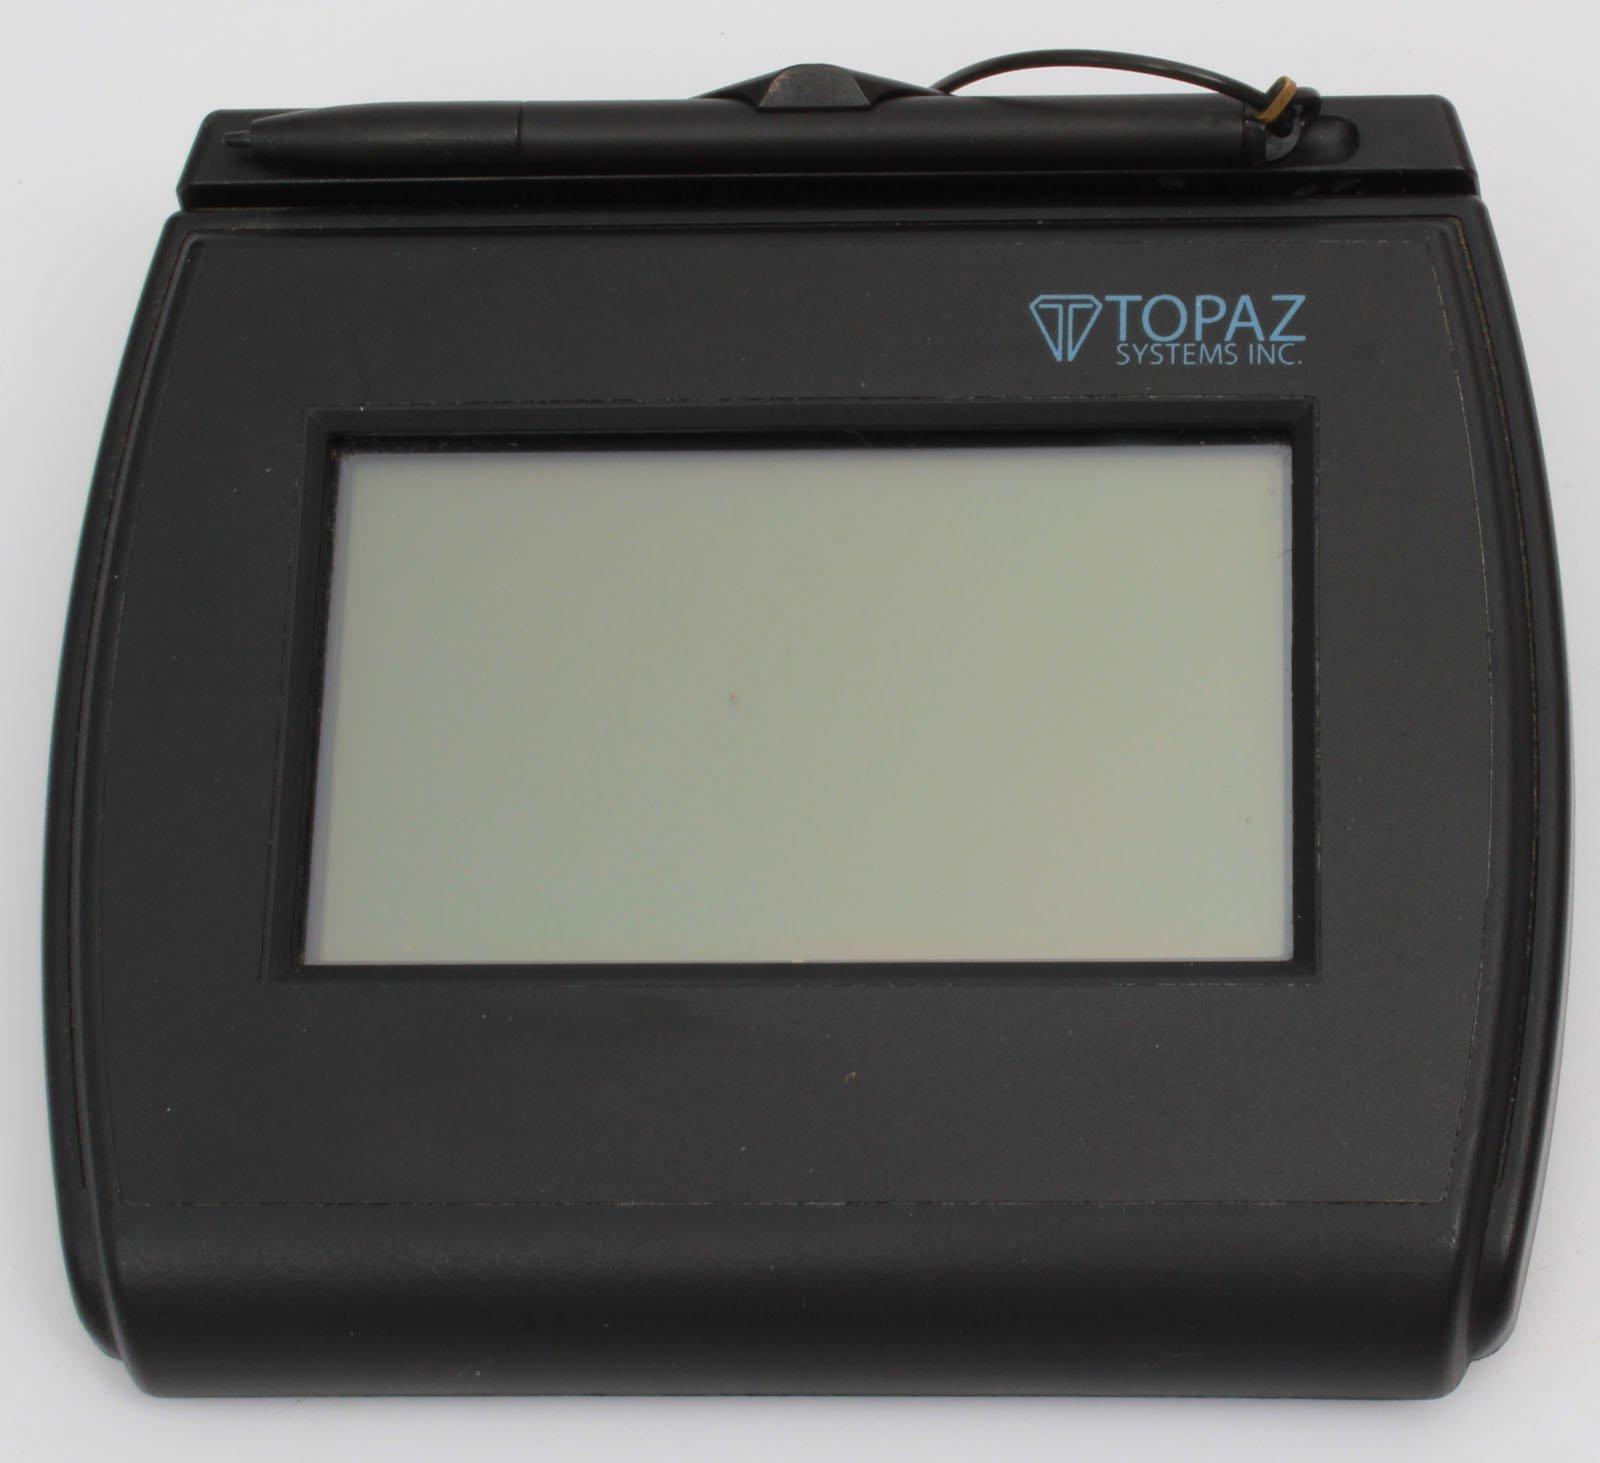 Topaz T-LBK750-BHSB-R Backlit 4x3 LCD Signature Capture Pad Dual Serial/USB by Topaz